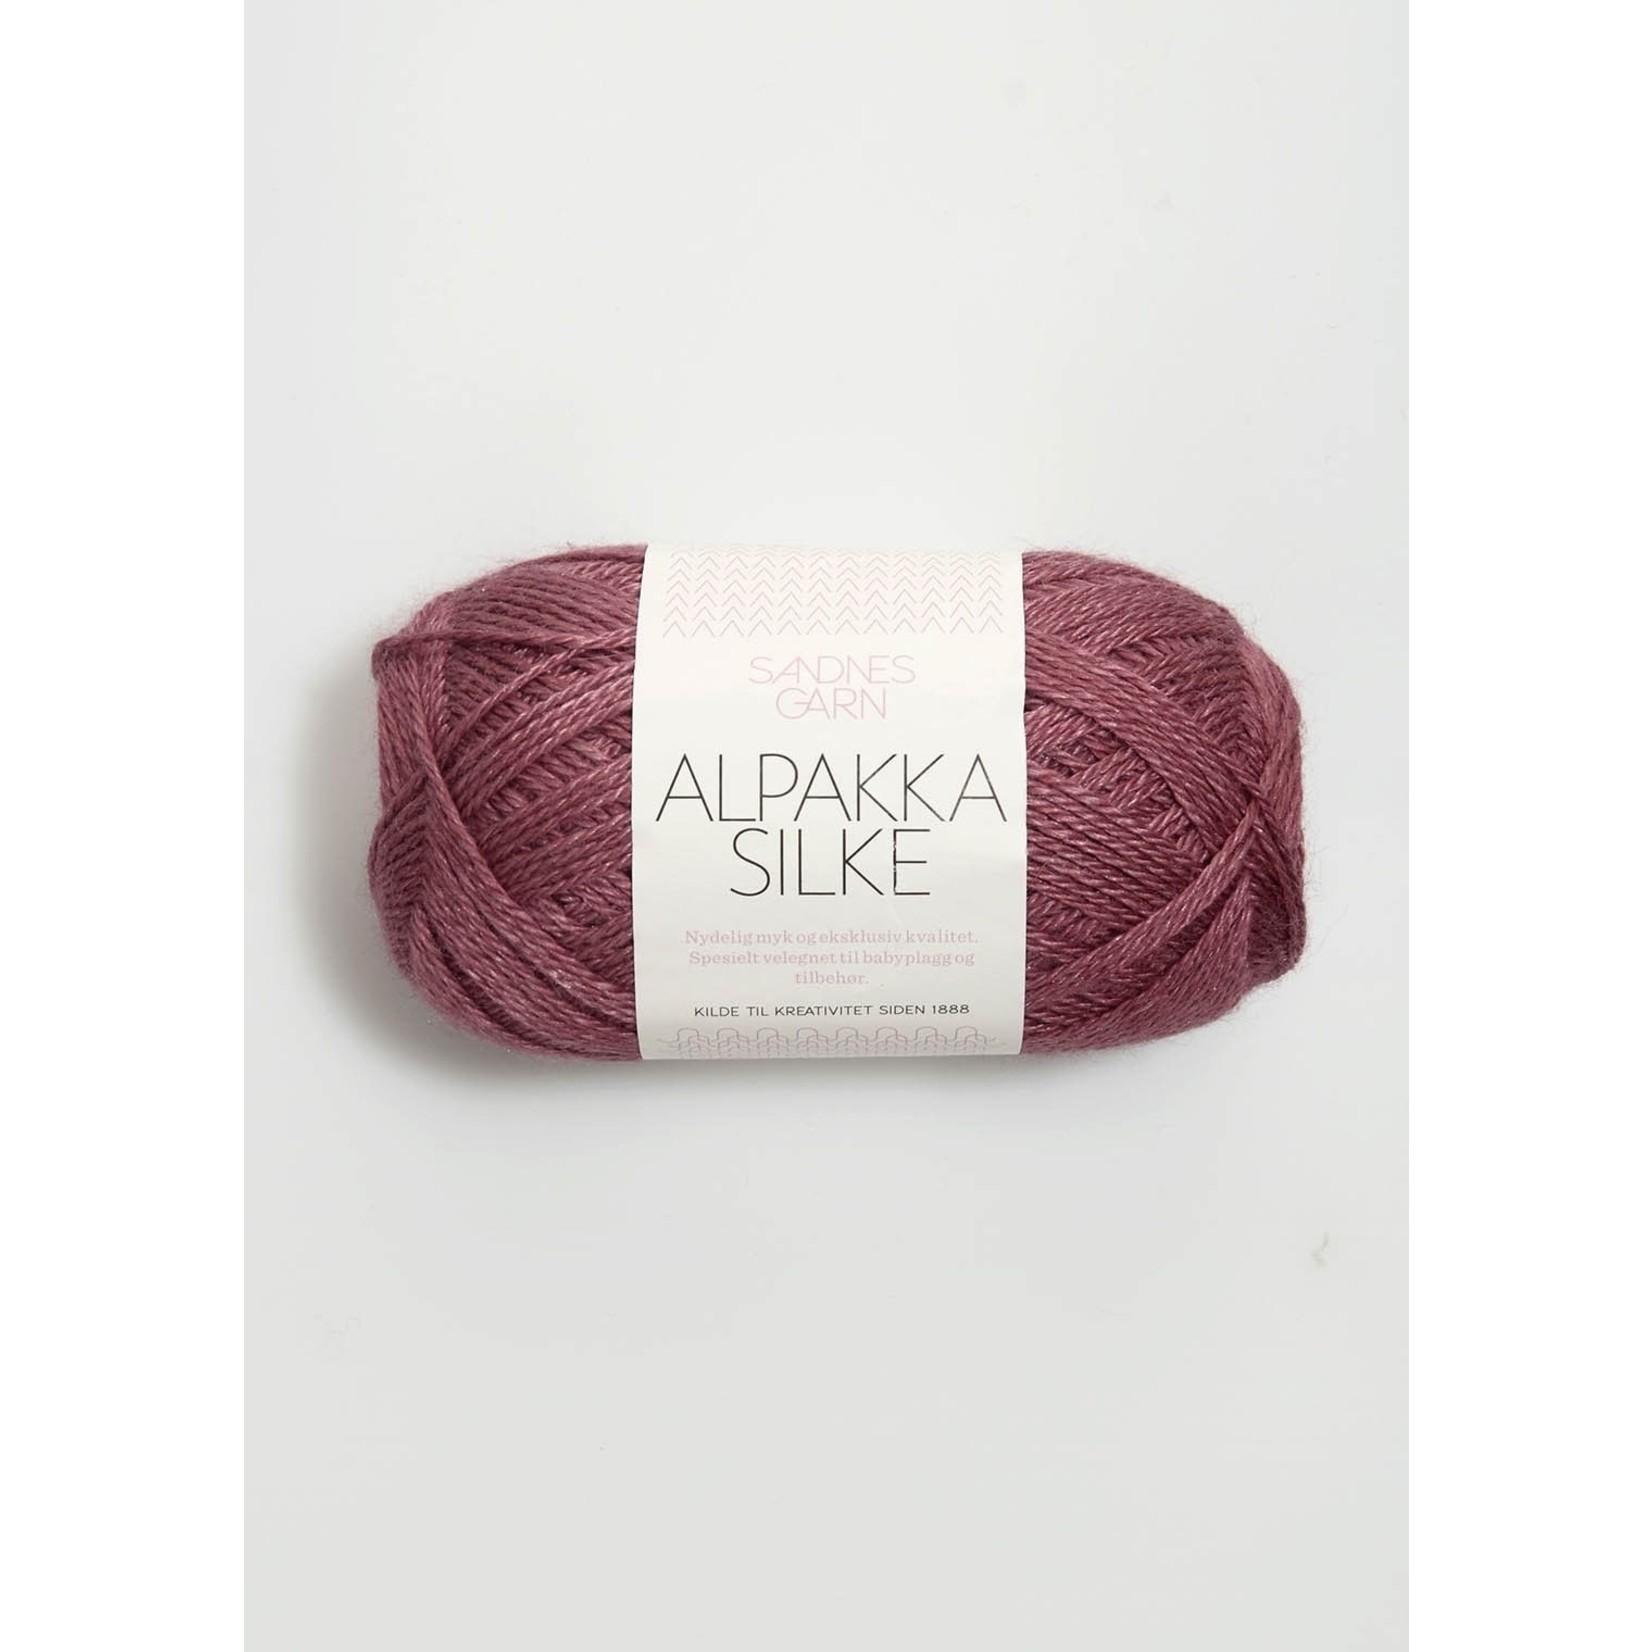 Sandnes Garn Alpakka Silke, 4244, Dark Old Pink